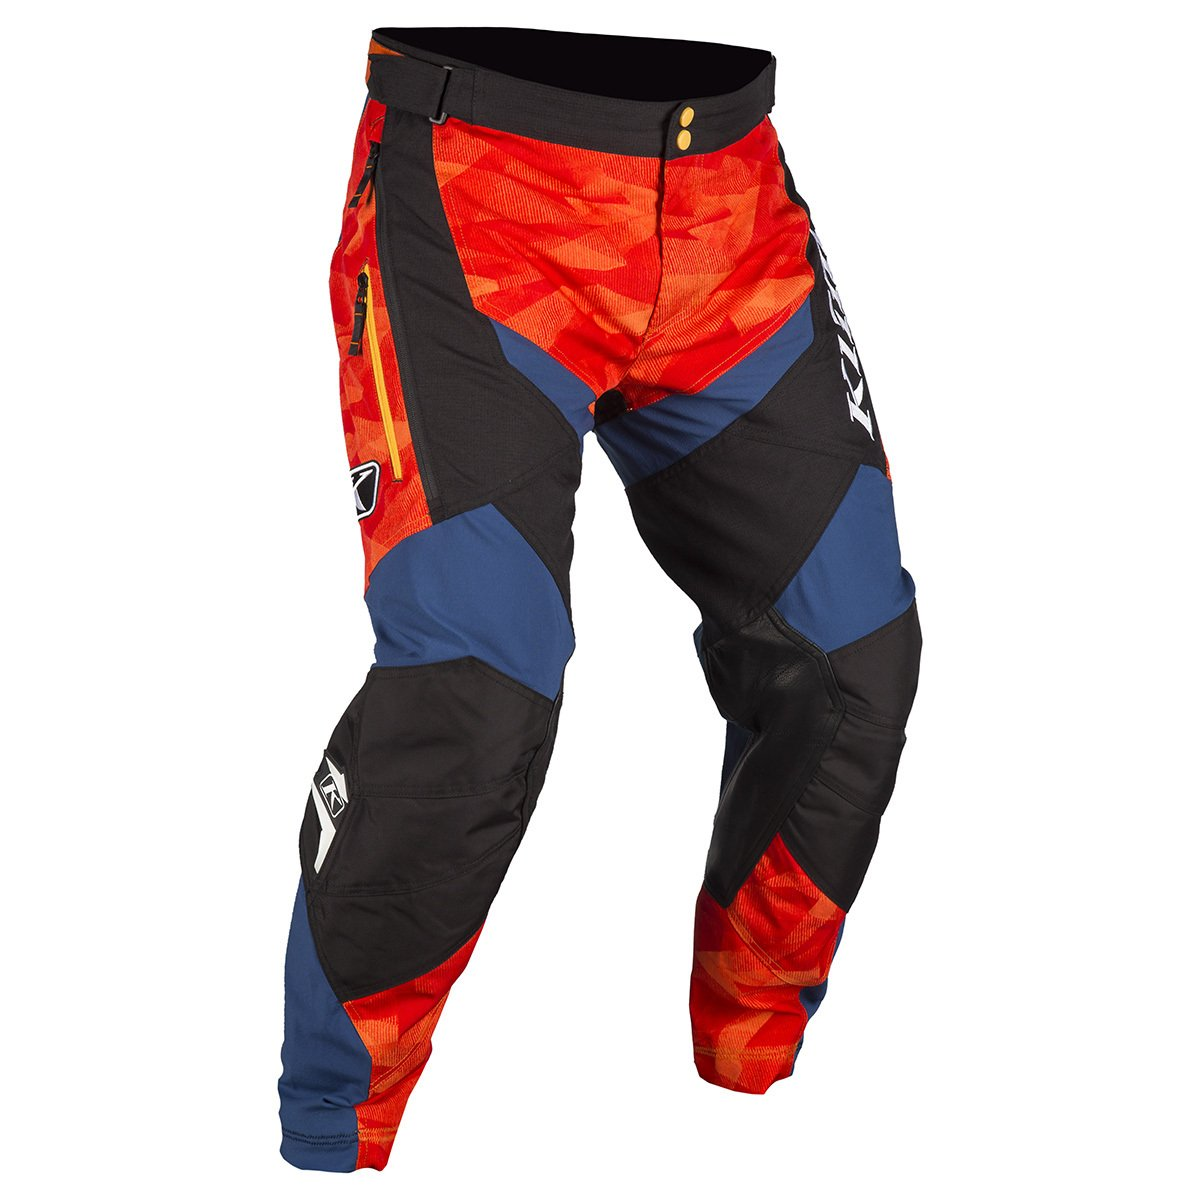 Klim Dakar In The Boot Pant - 36 / Orange